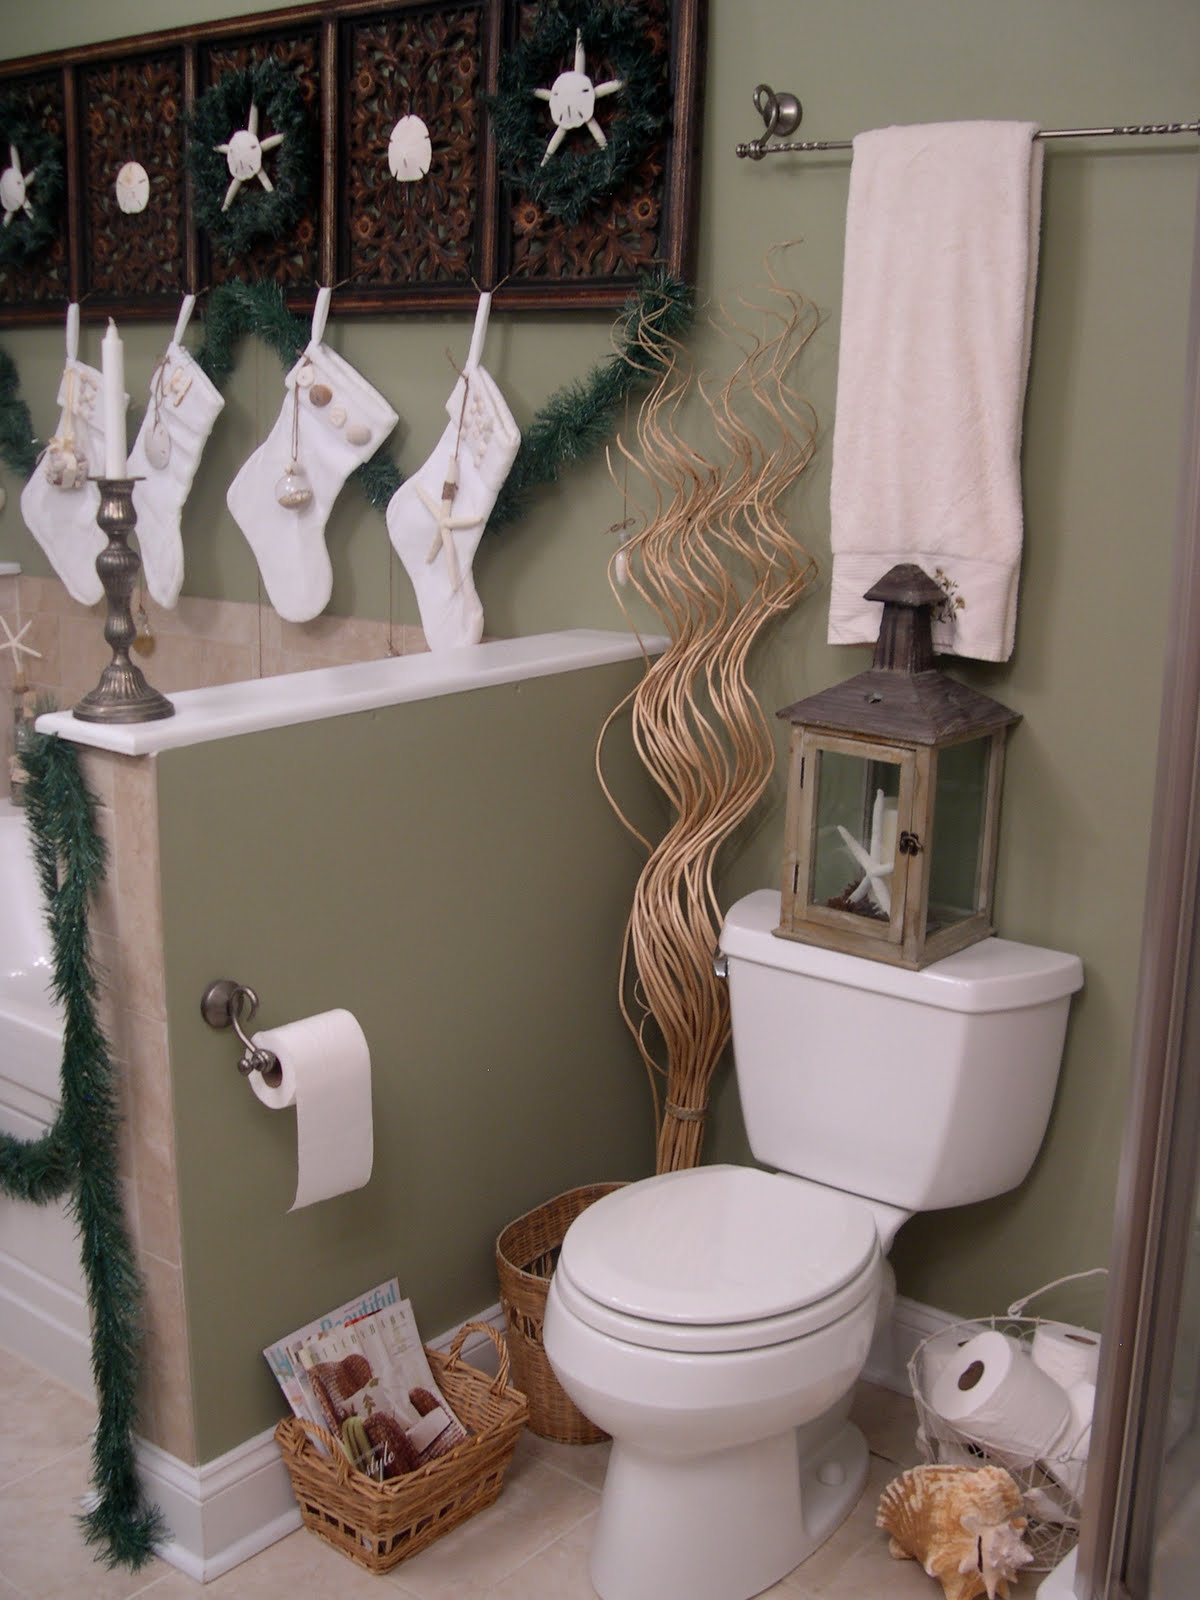 Diy christmas bathroom decor - Diy Christmas Bathroom Decor 32